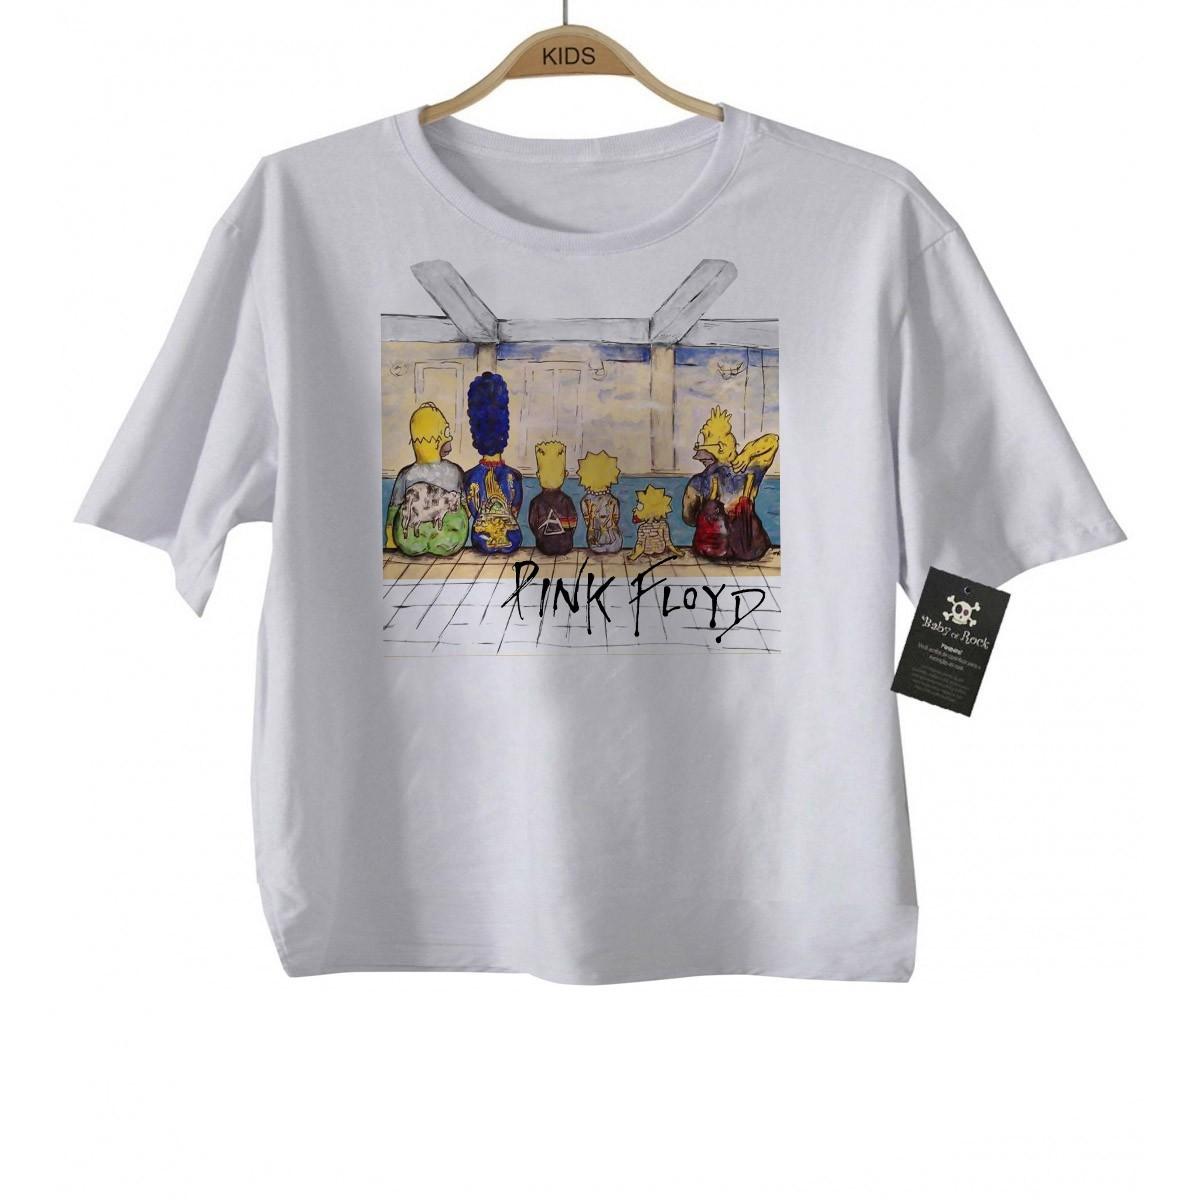 Camiseta KIDS de Rock Infantil -  Pink Floyd Simpsons - White  - Baby Monster S/A